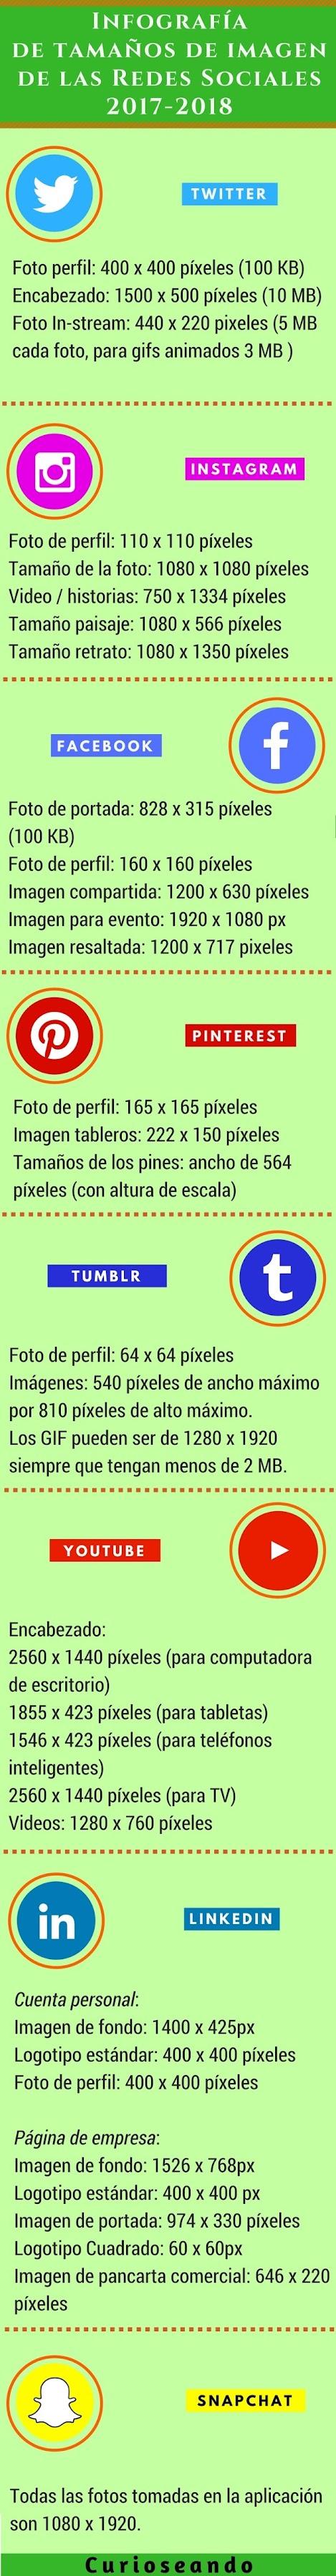 infografia-imagen-redes-sociales